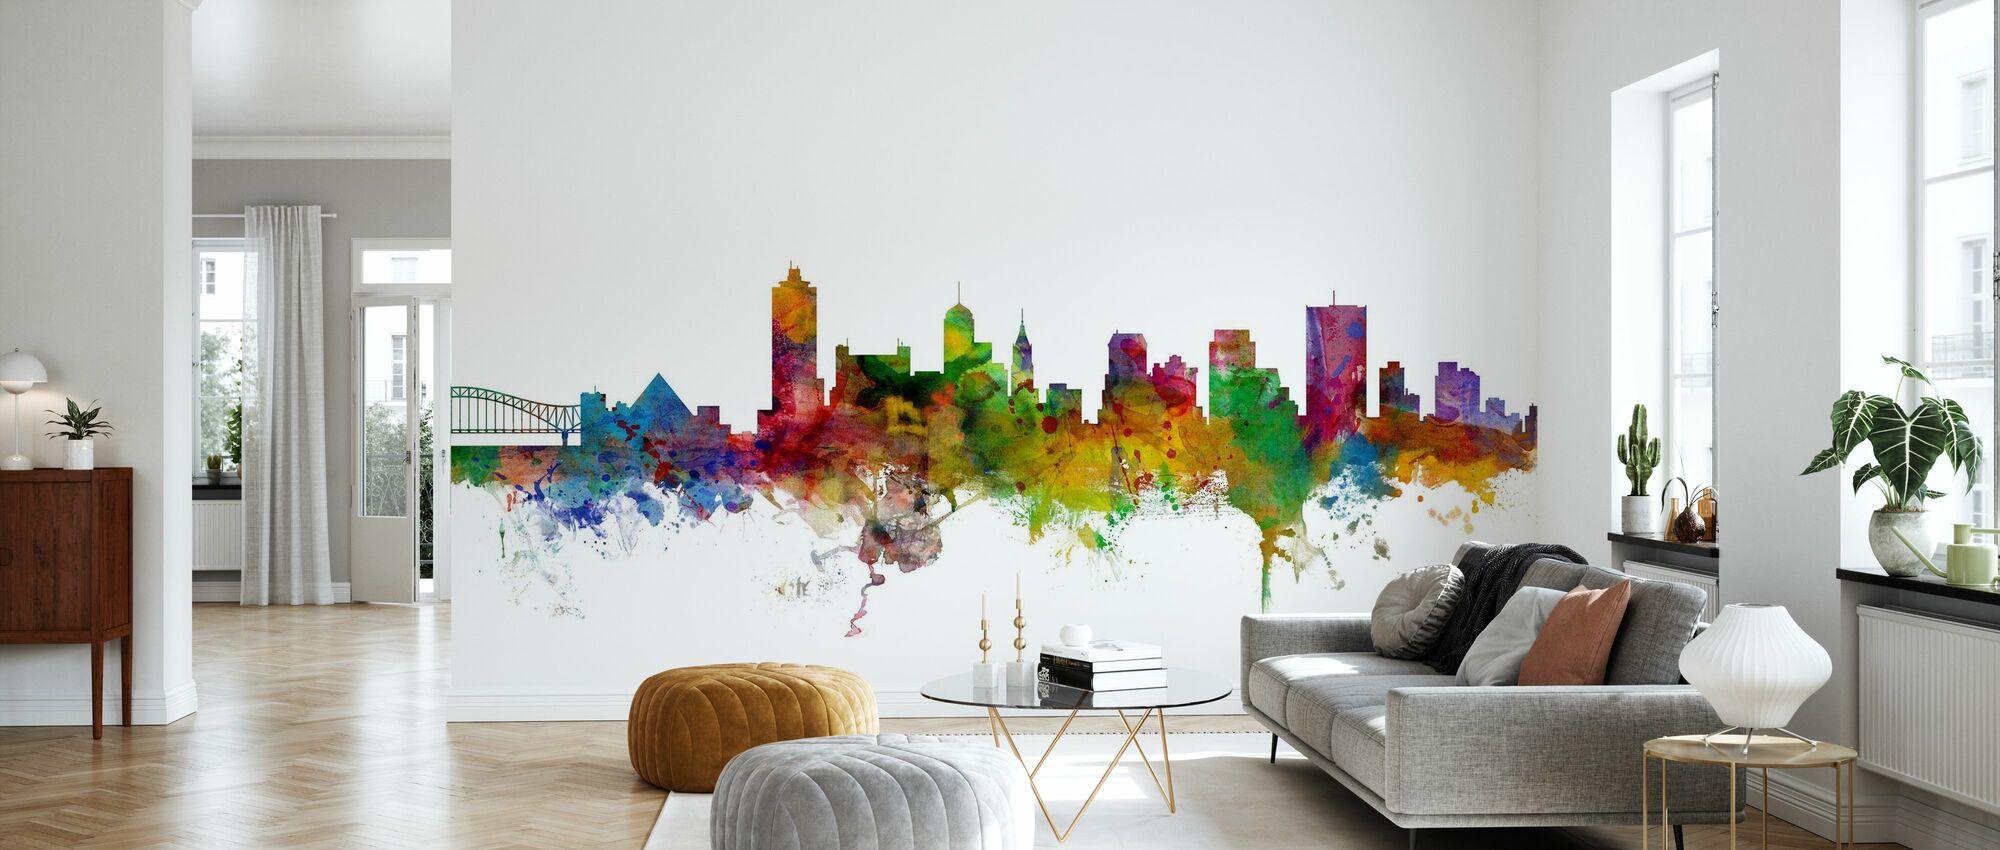 Memphis Tennessee Skyline - Wallpaper - Living Room